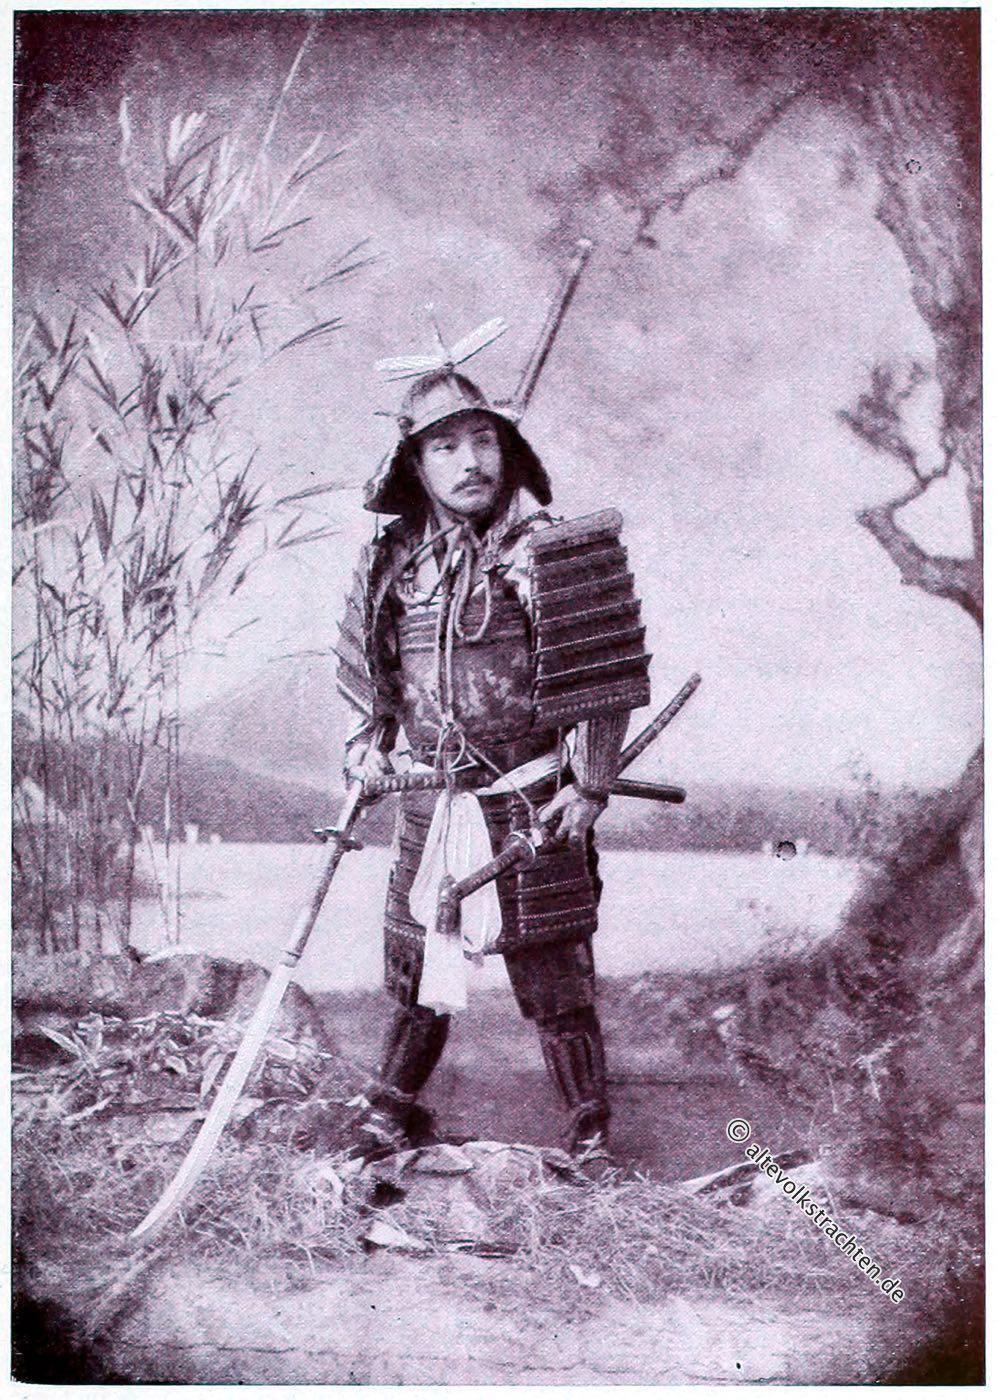 Captain F. Brinkley, Samurai, Samuraischwert, Rüstung, Kostüm, Japan, Kazuma Ogawa